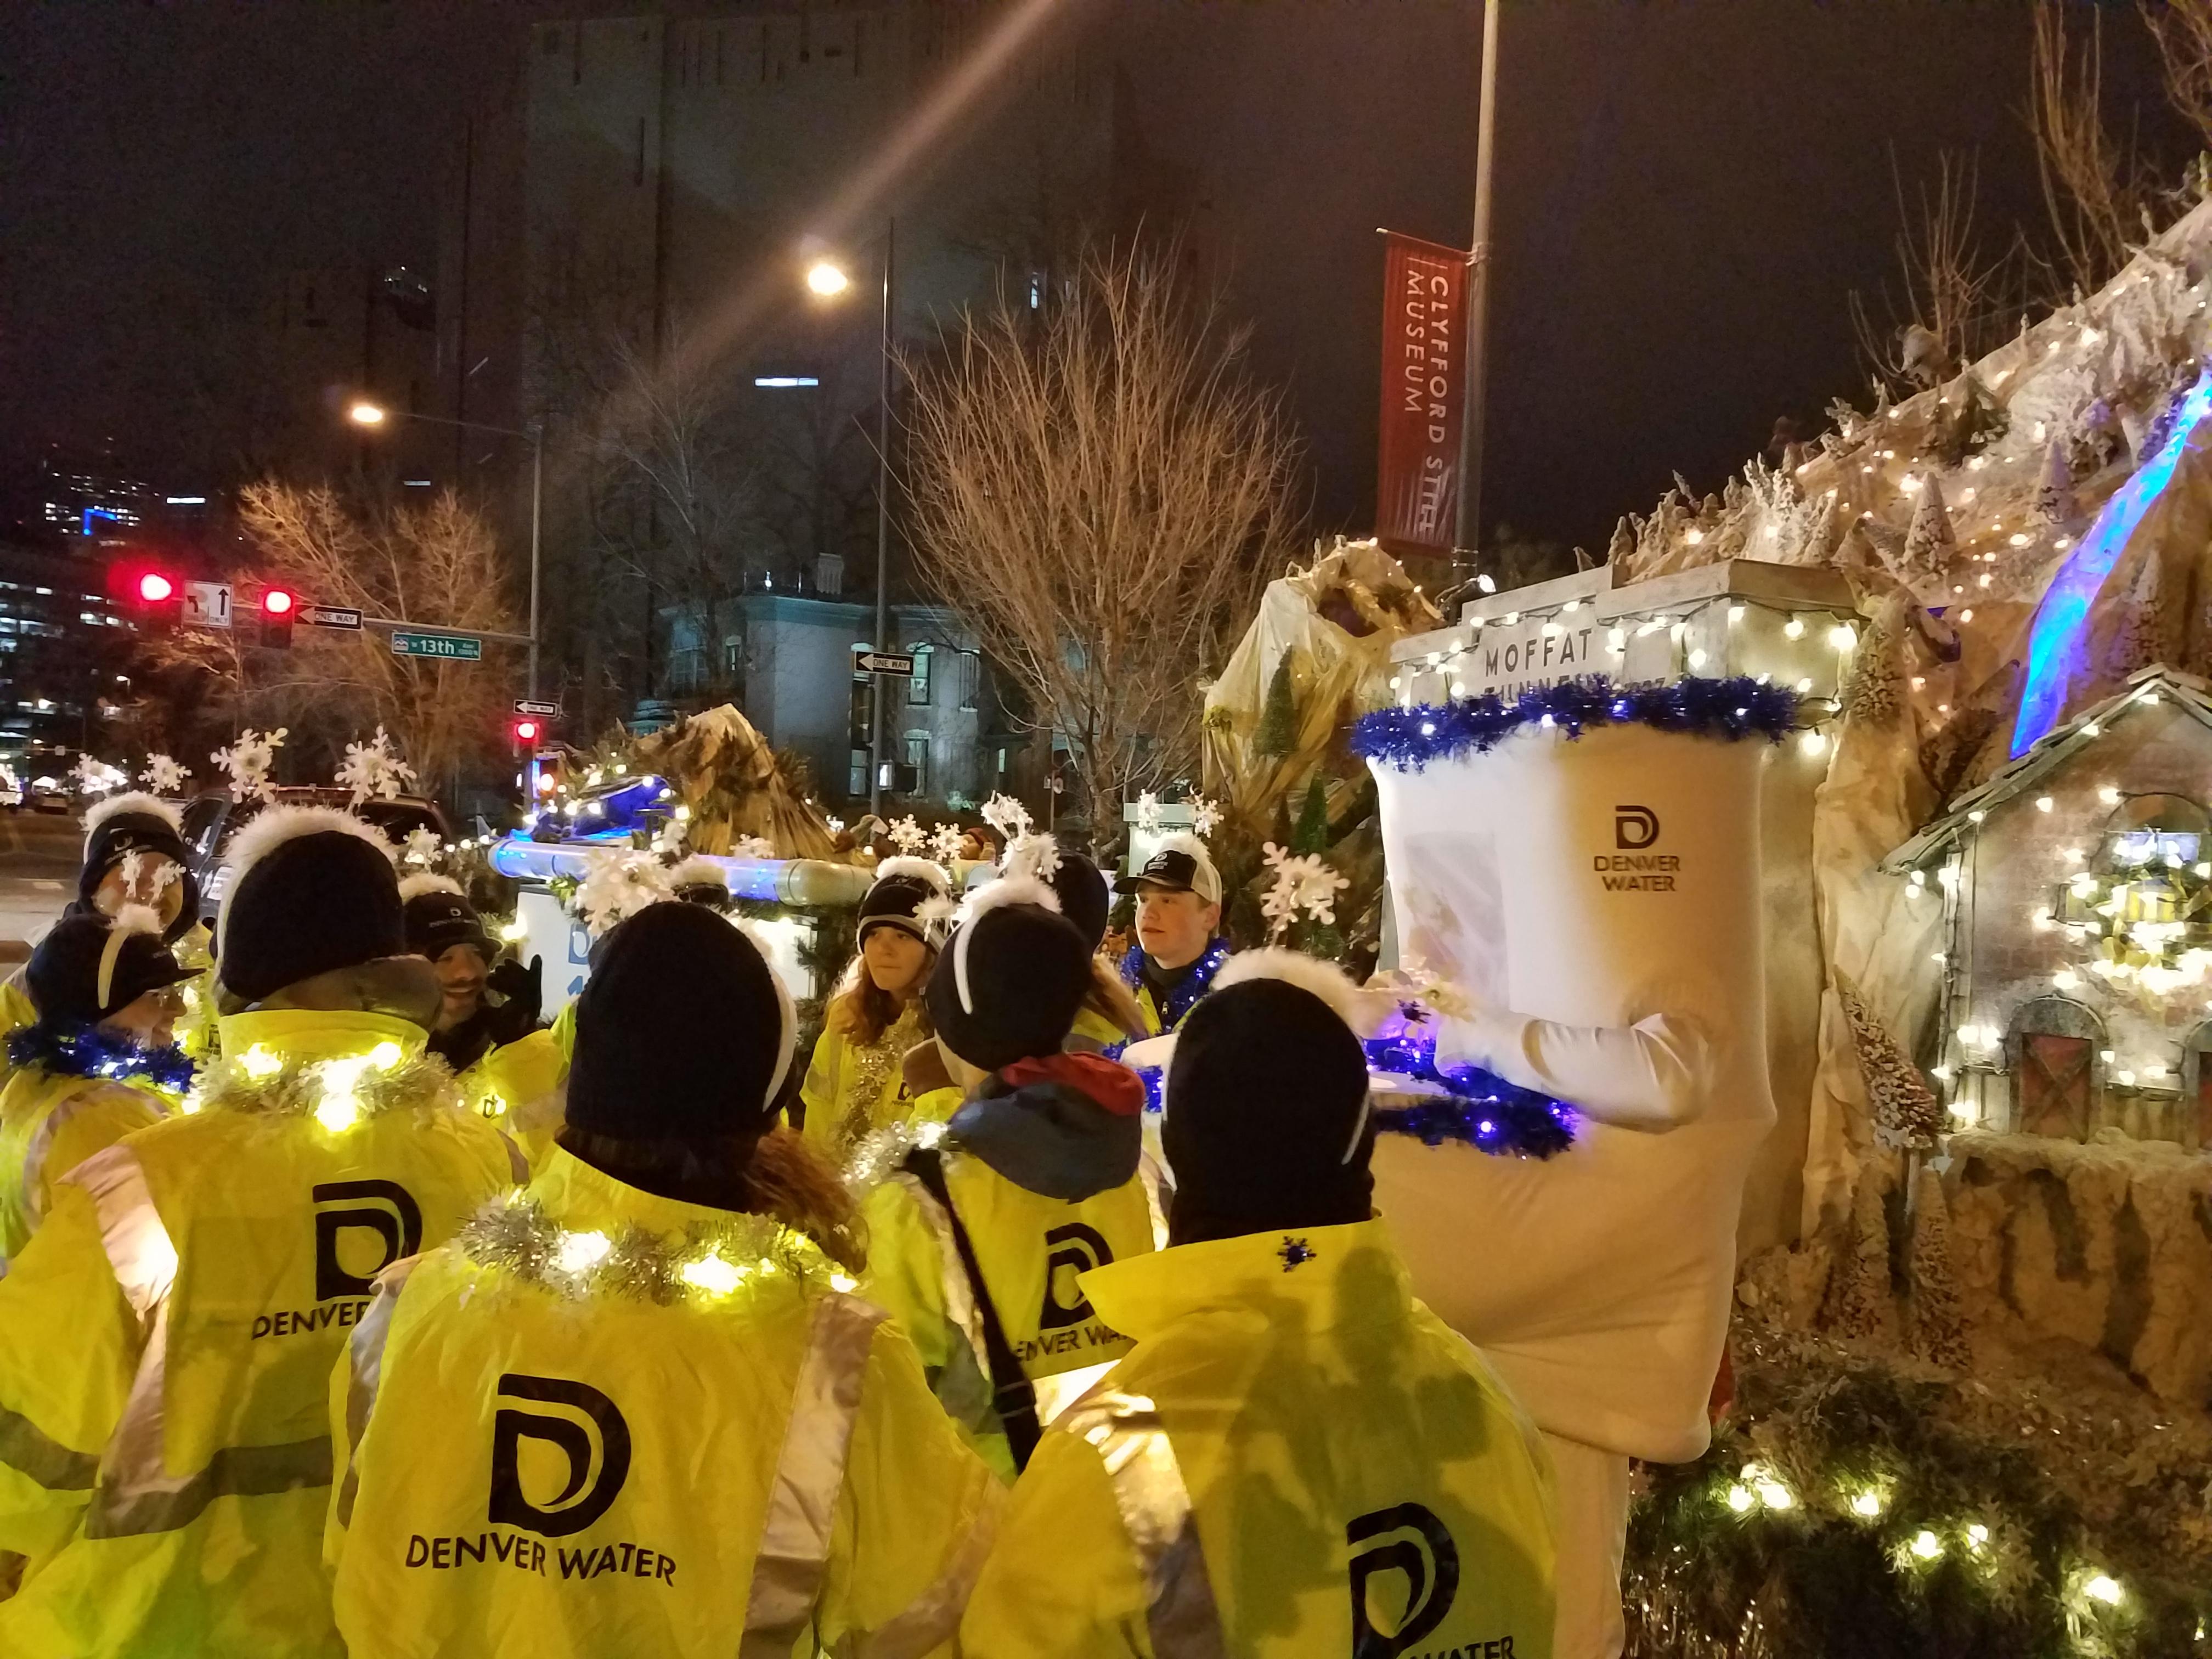 Denver Community Christmas Parade 2021 Denver Water Celebrates At 9news Parade Of Lights Denver Water